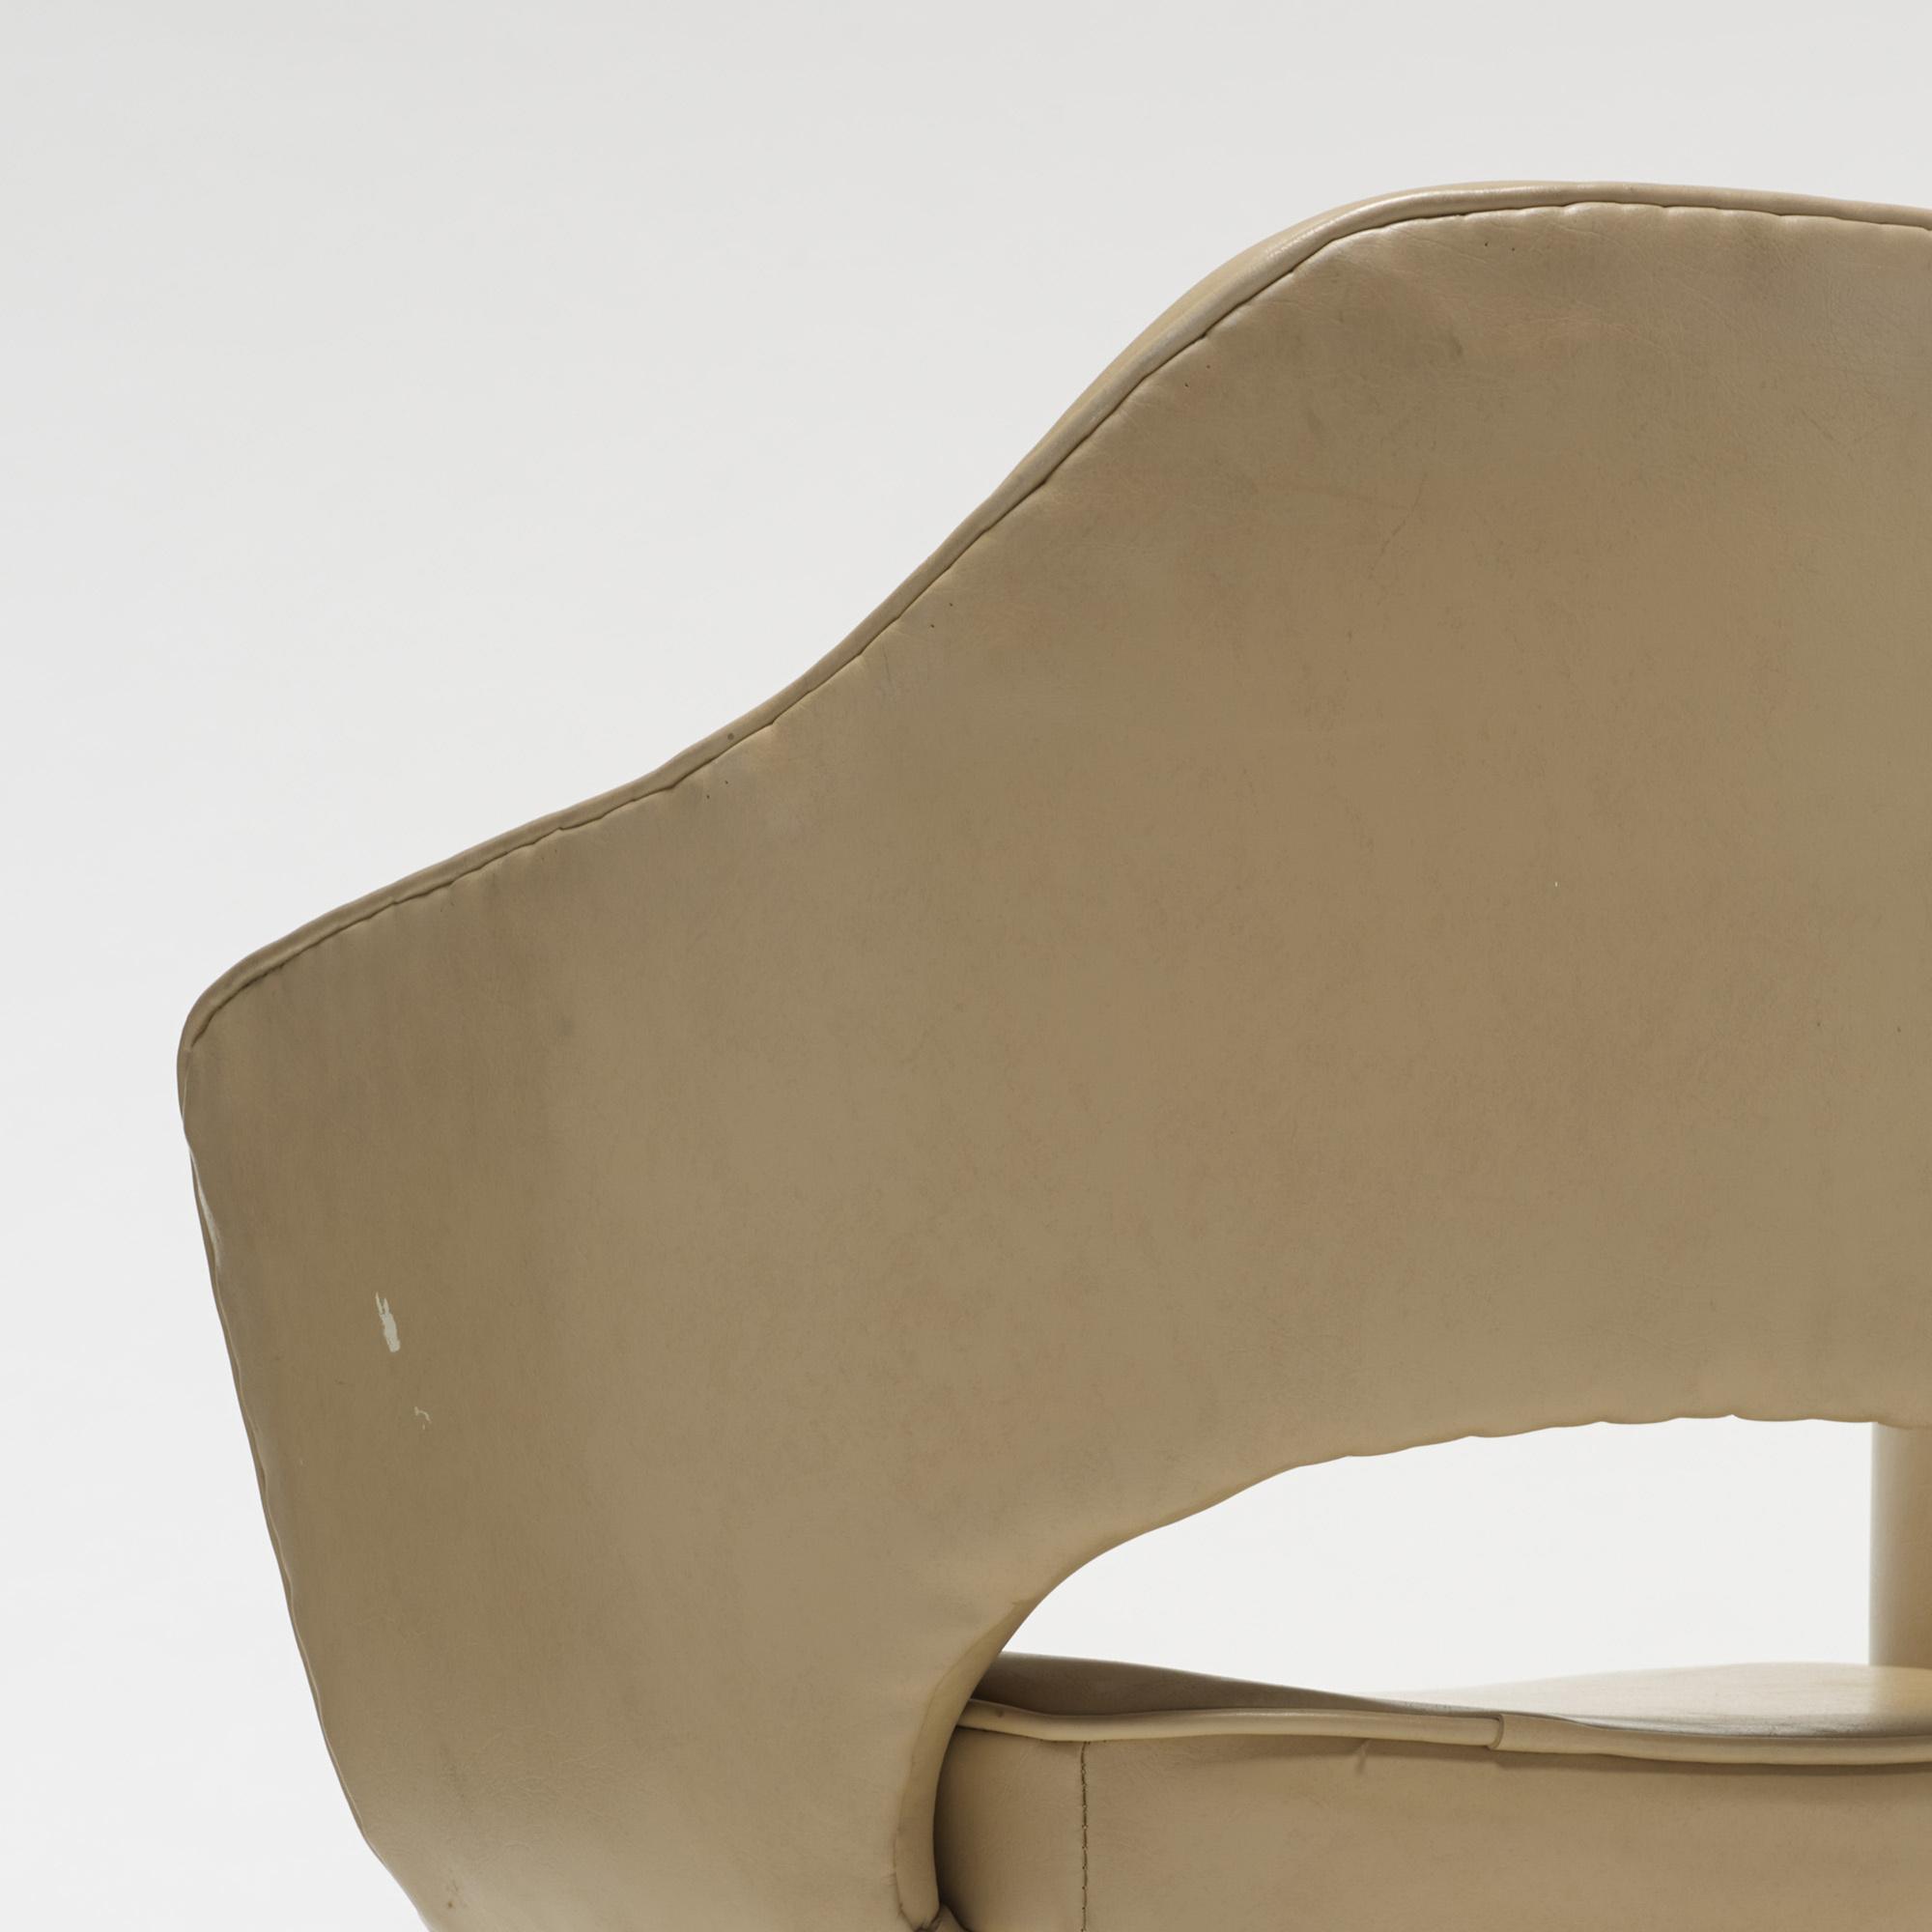 701: Eero Saarinen / Executive armchairs, pair (4 of 4)